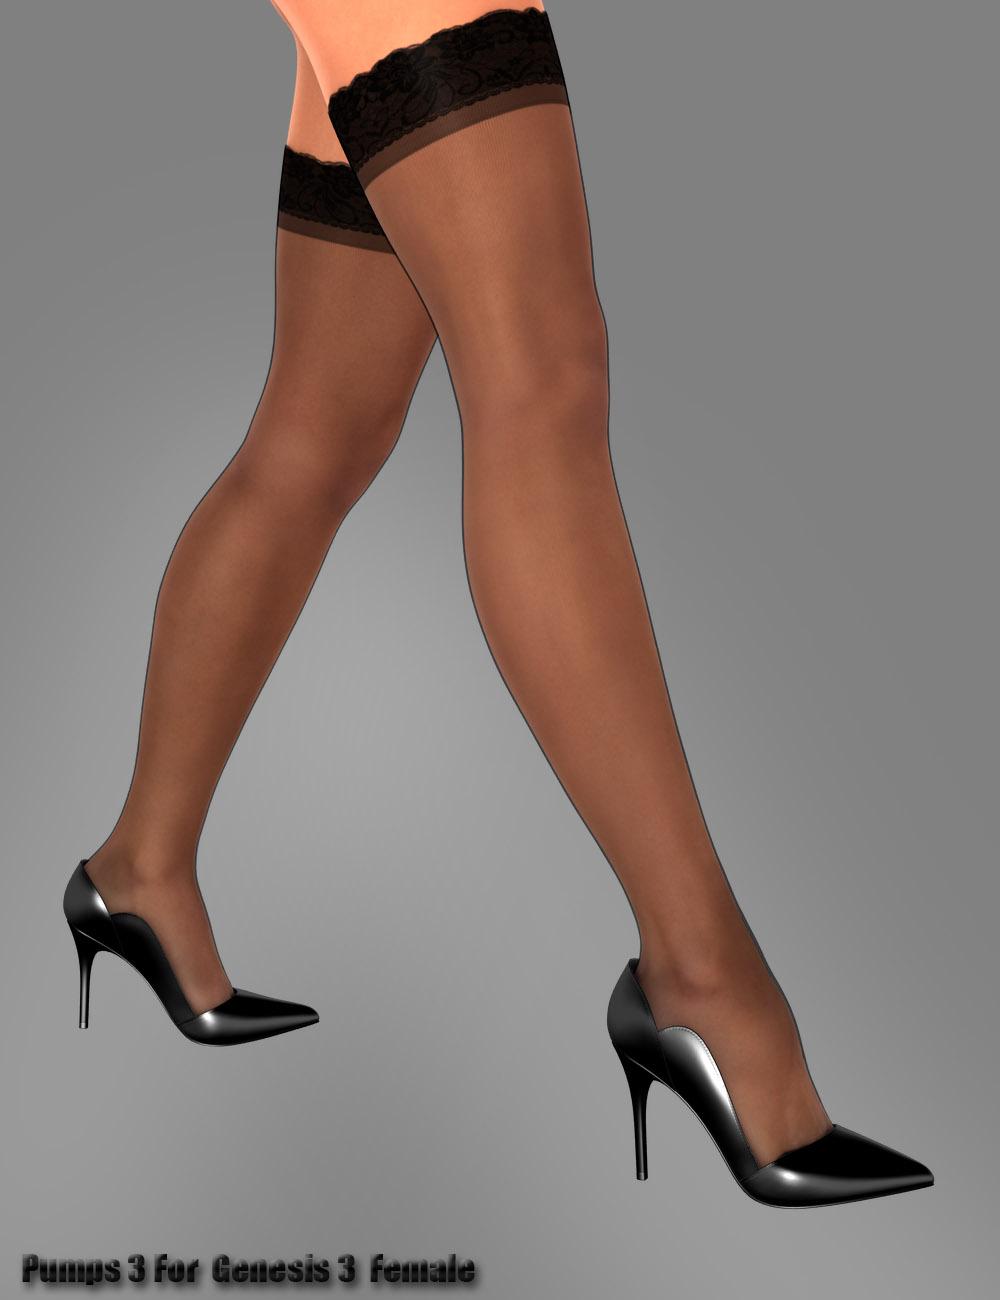 Pumps 3 for Genesis 3 Female(s) by: dx30, 3D Models by Daz 3D